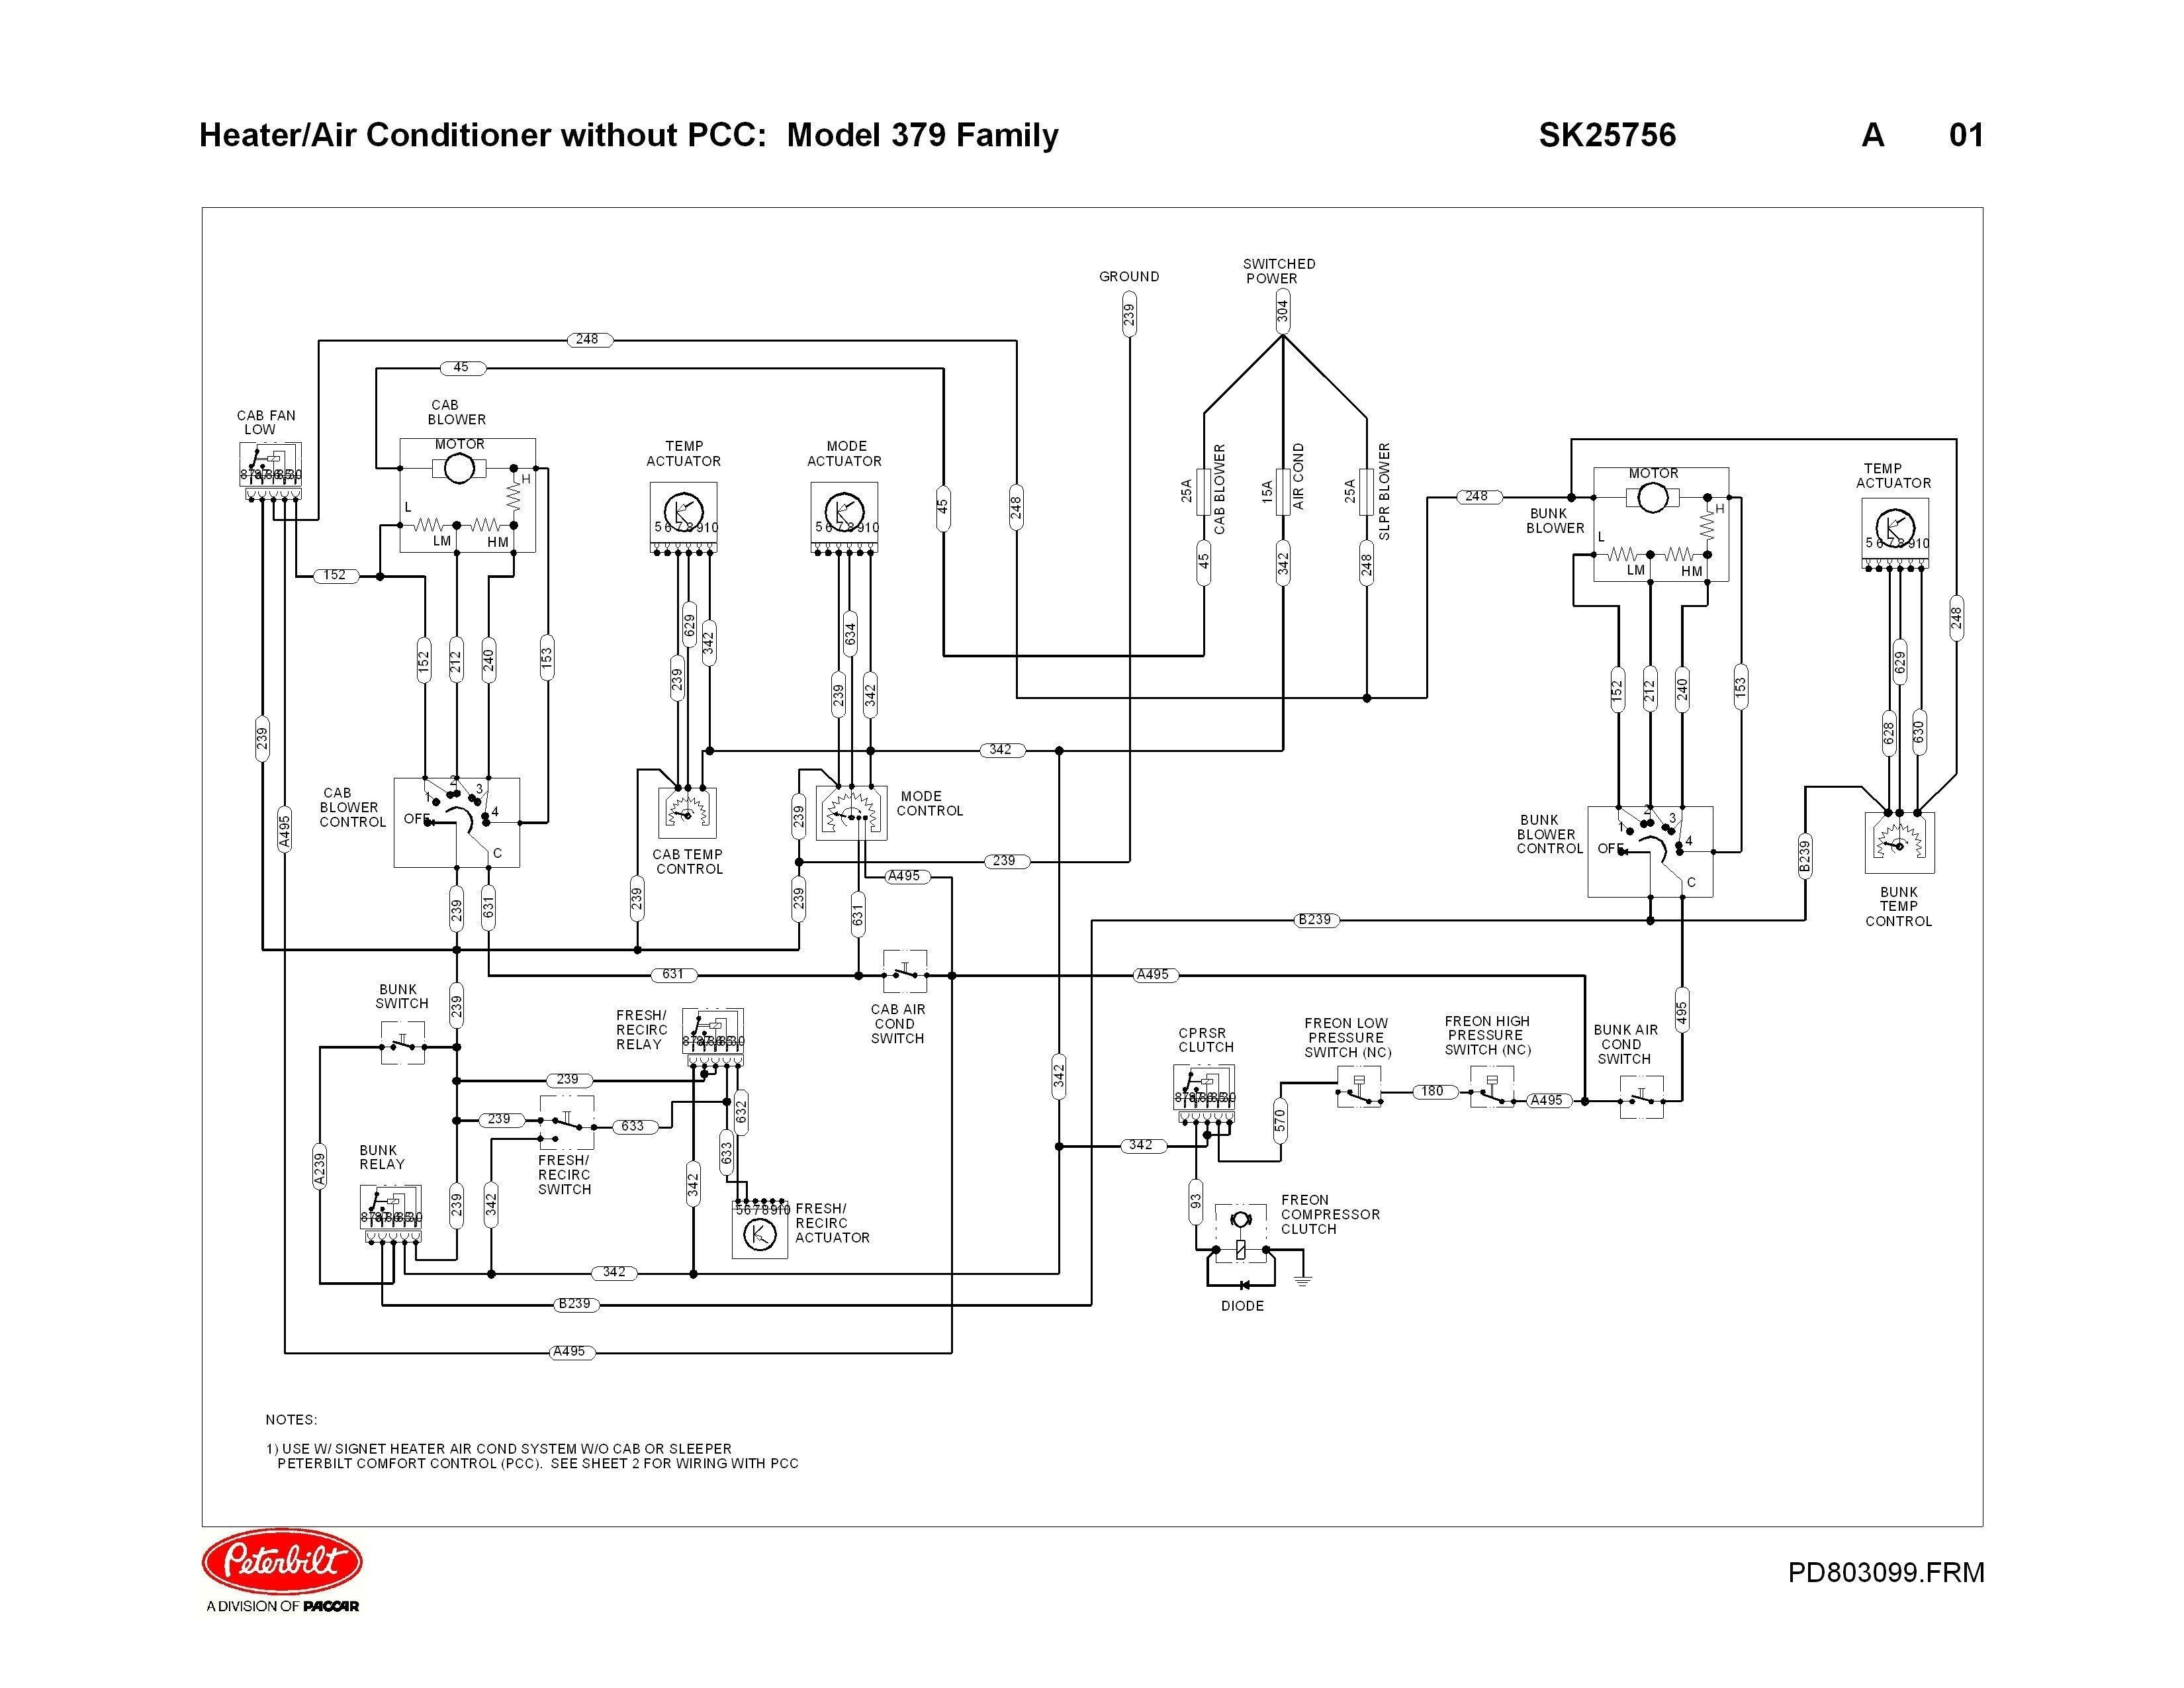 Peterbilt Speedometer Wiring Diagram Trusted Wiring Diagrams In 2021 Peterbilt Peterbilt 379 Peterbilt 359